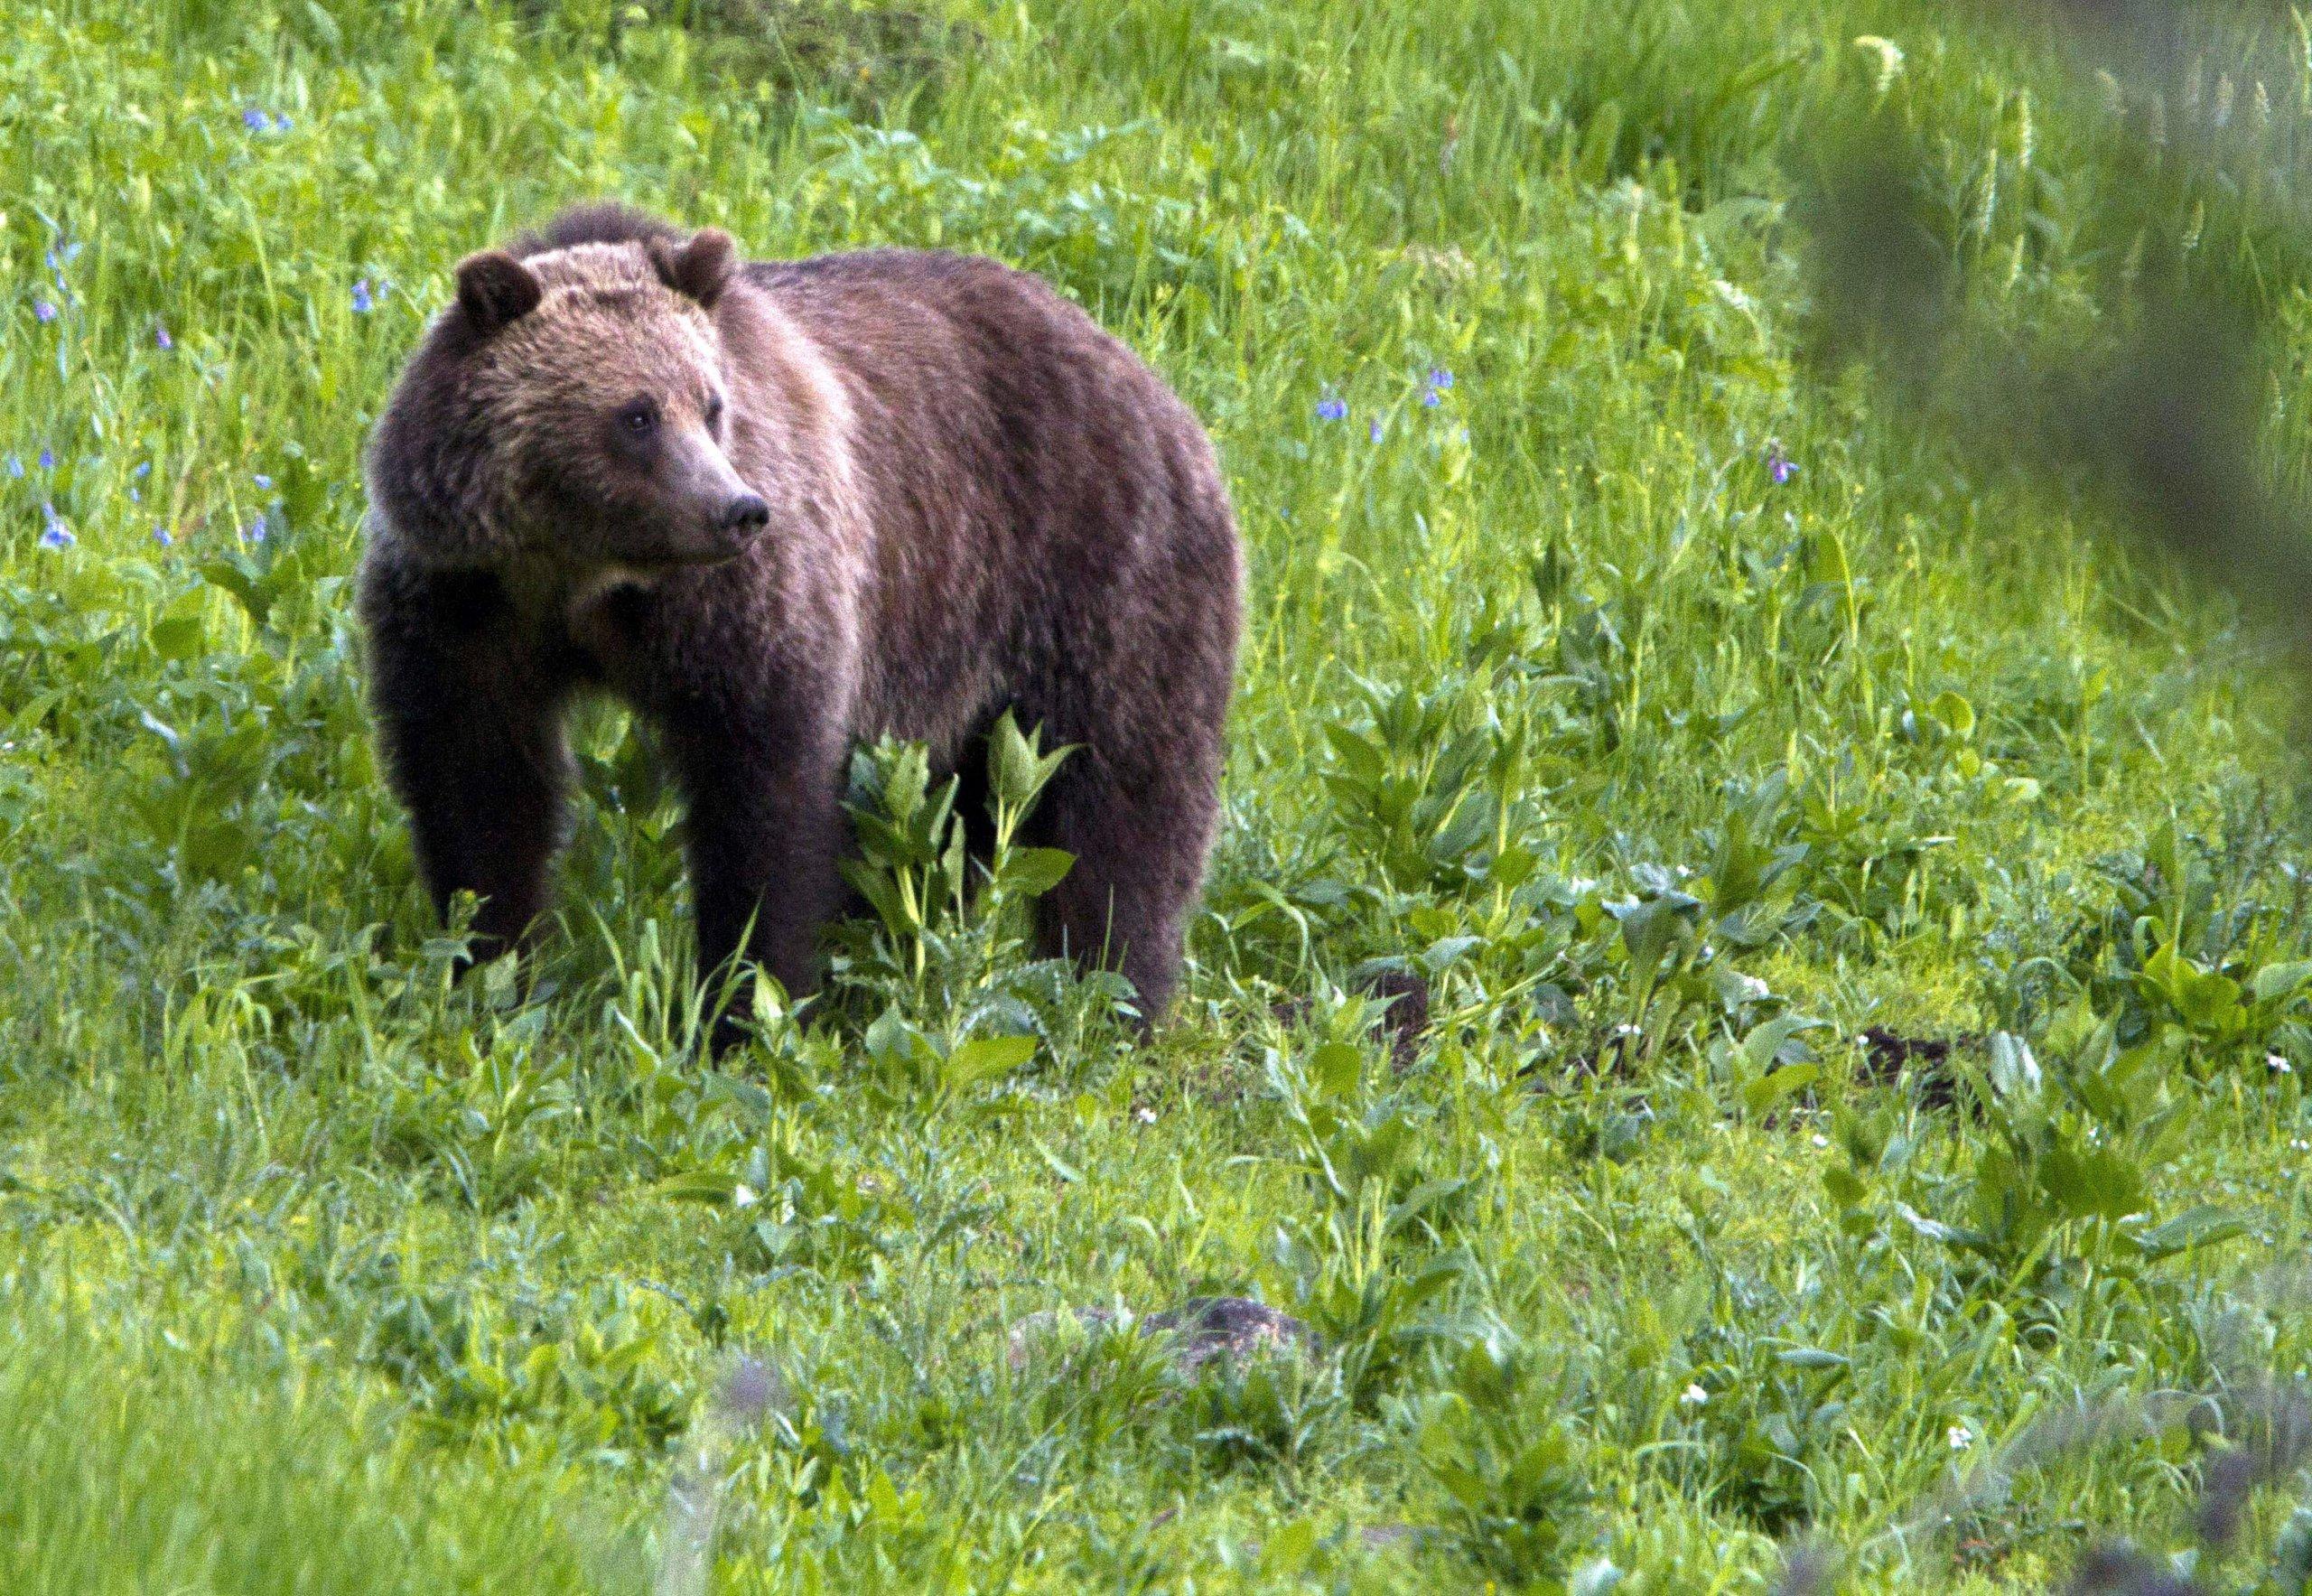 Grizzly Bear Attacks Man in Alaska